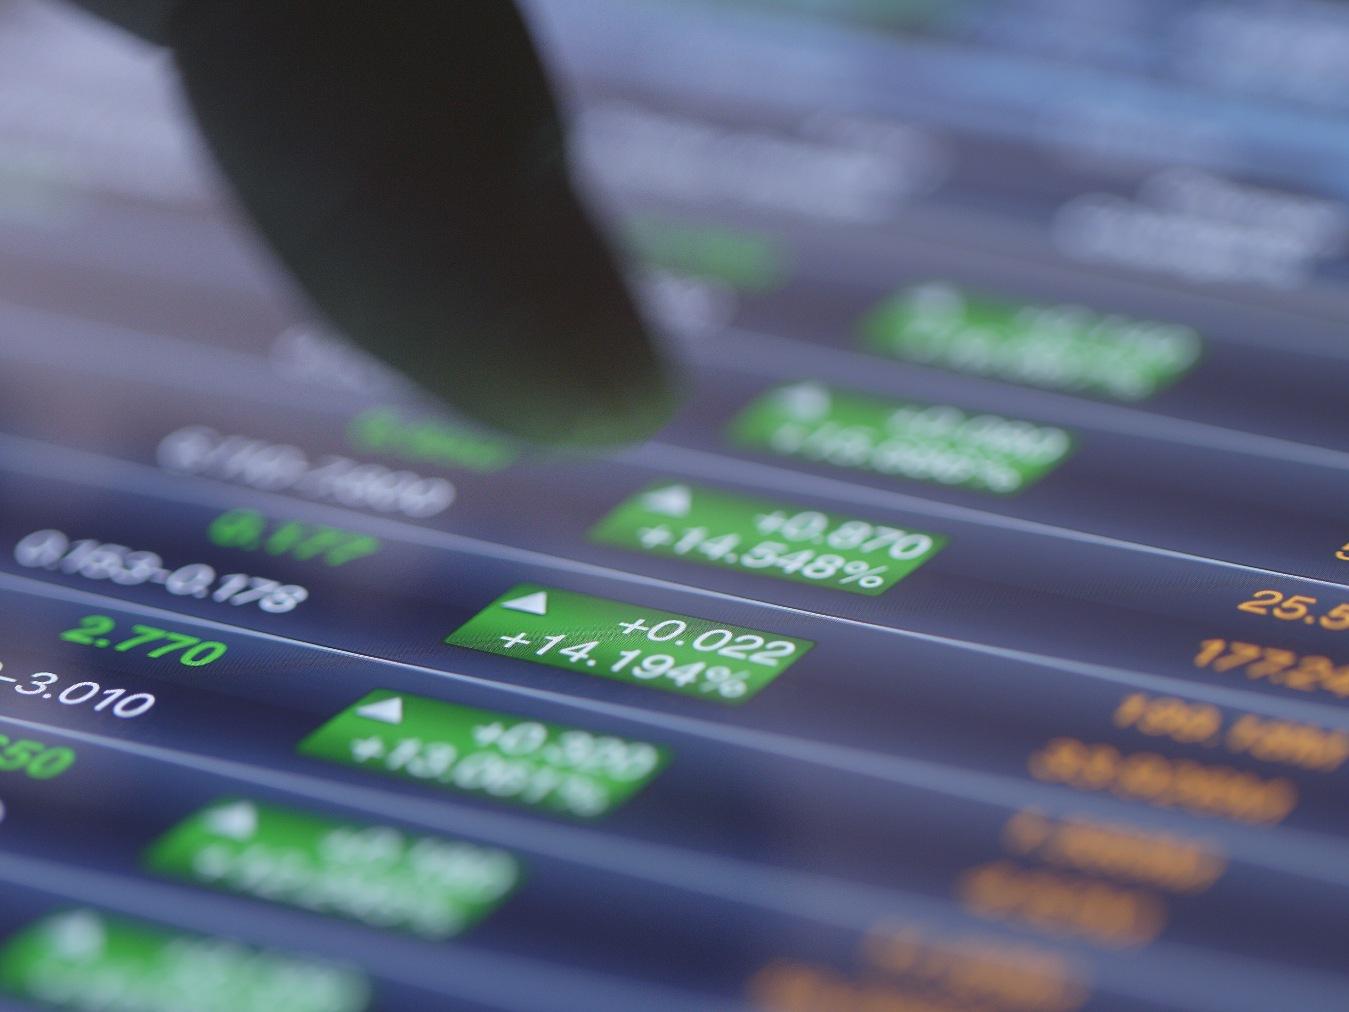 BOSS直聘-在線招聘平台-中概股上市-美股ipo-國家安全-國家機密-中概股追擊-香港財經時報HKBT